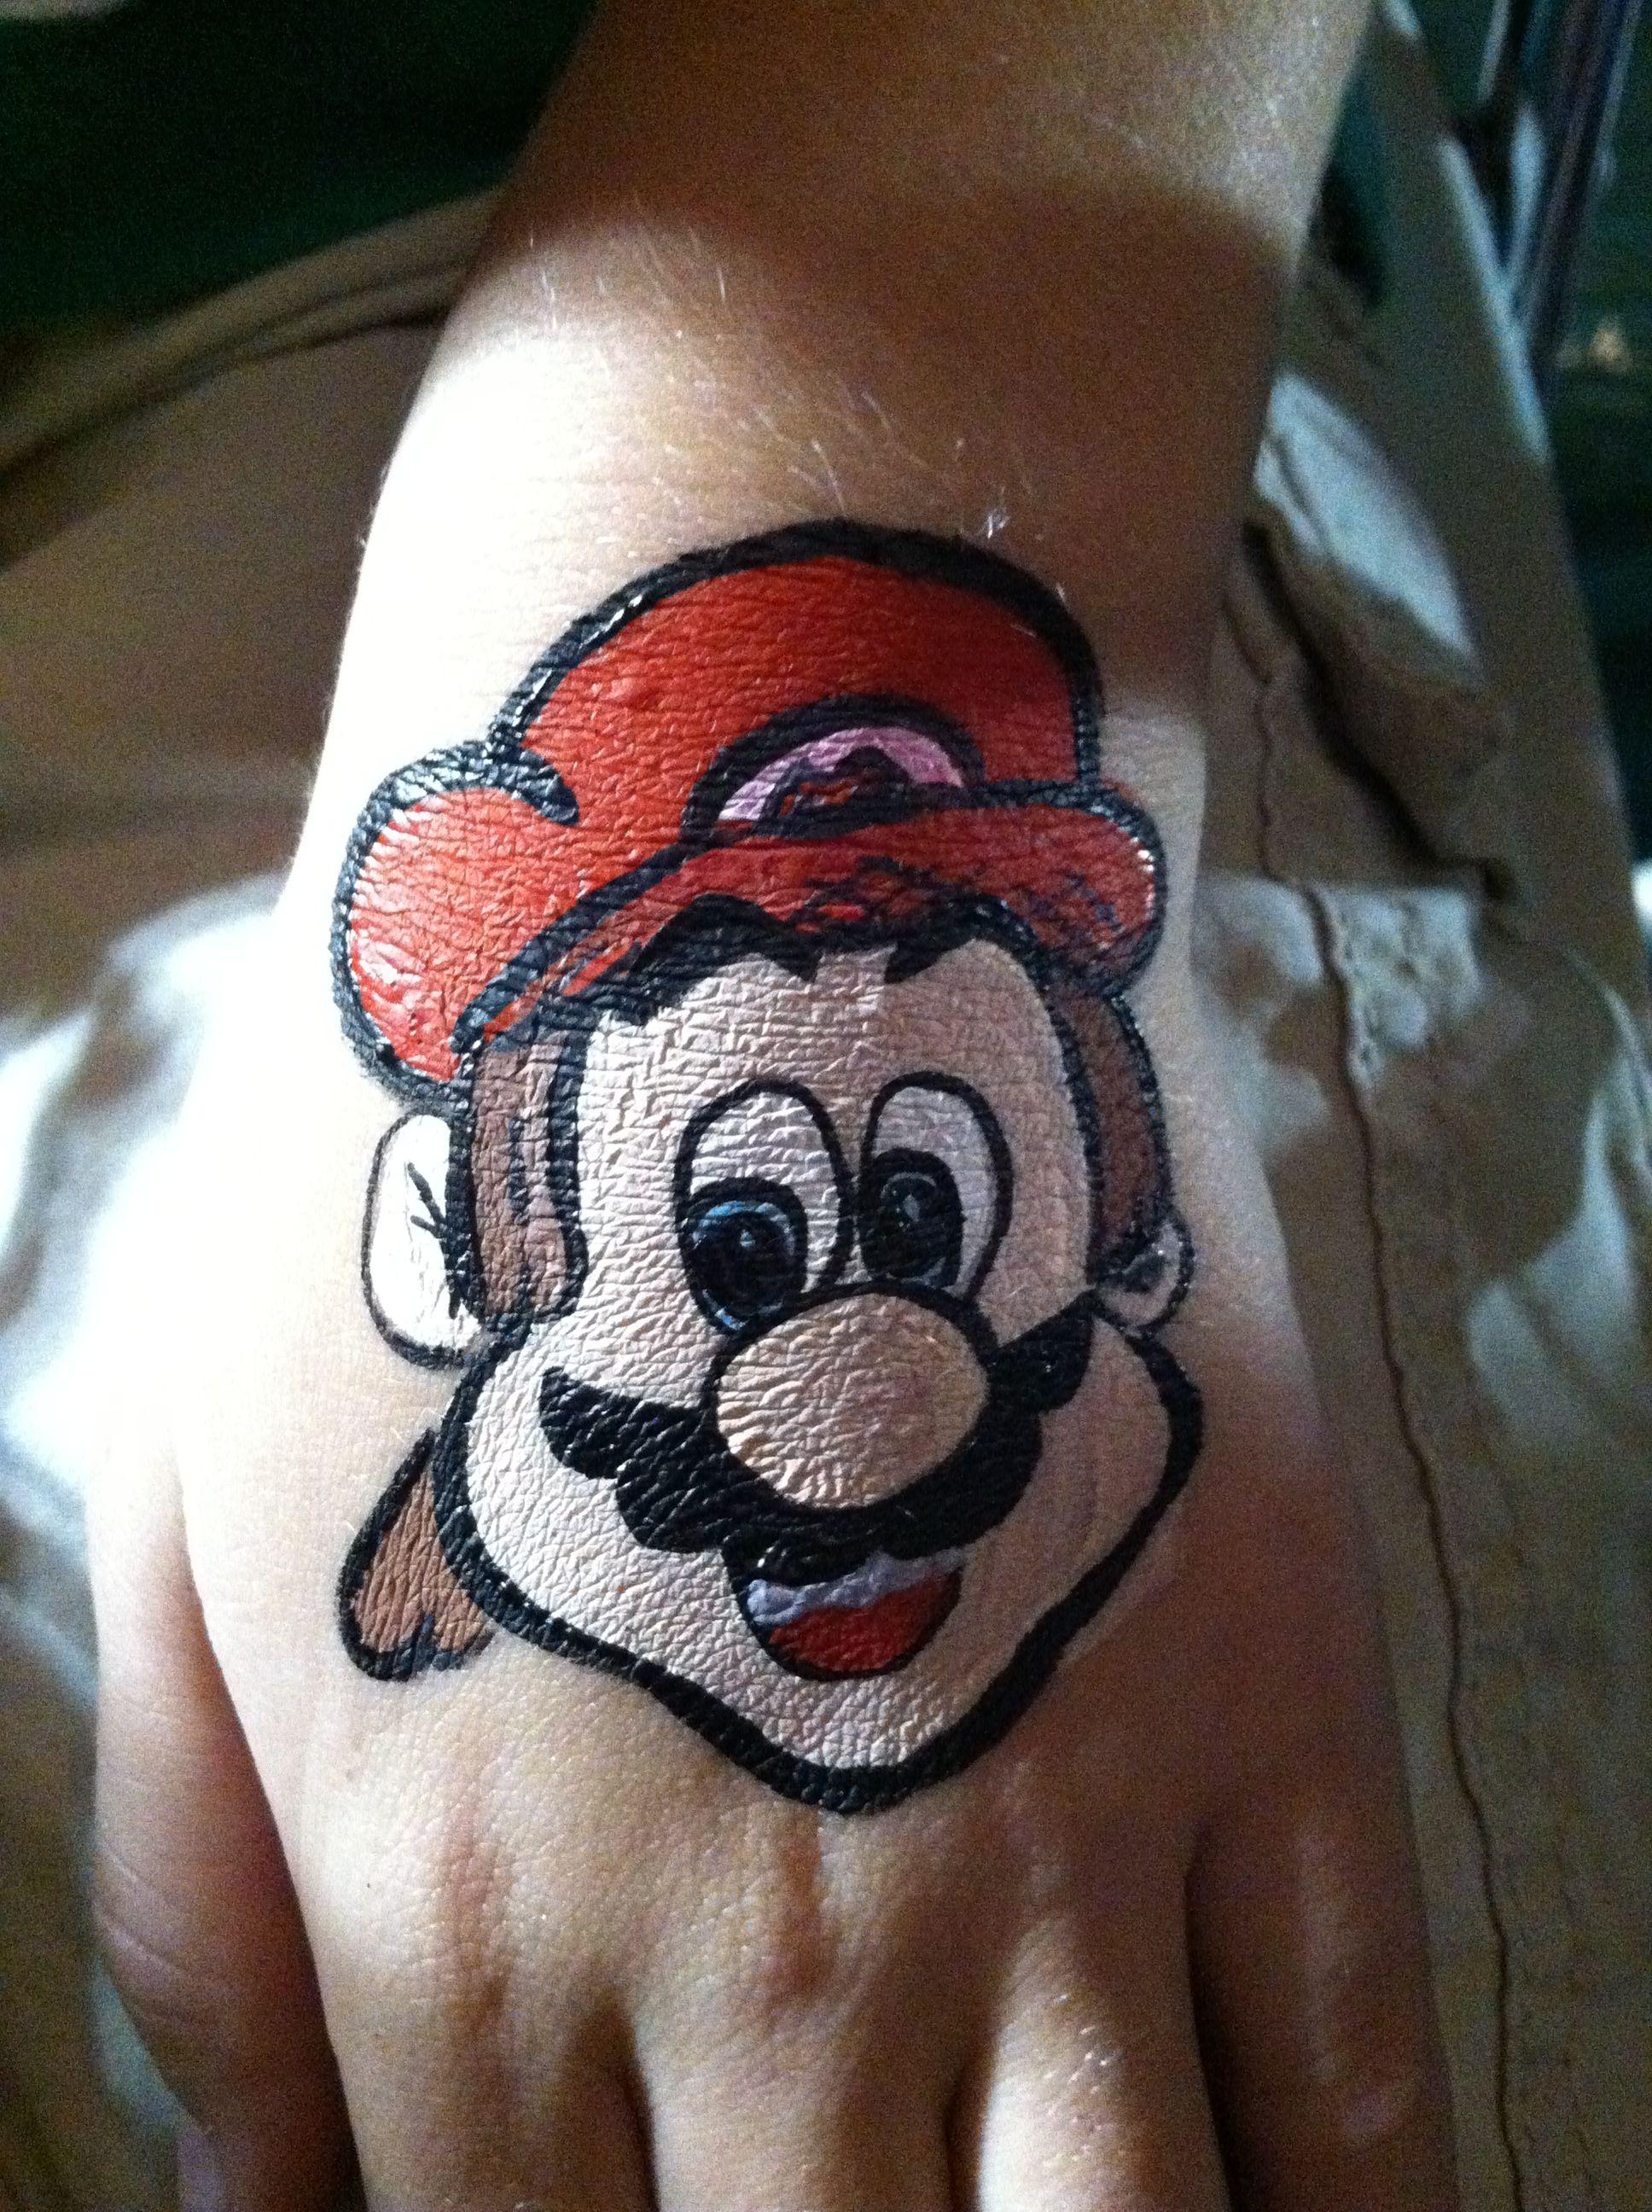 Nintendo's Mario!    #videogames #supermario #facepainting #birthdayparty #celebrate #entertainment #games #facepainter #mariobros #videogame #fun #themedparty